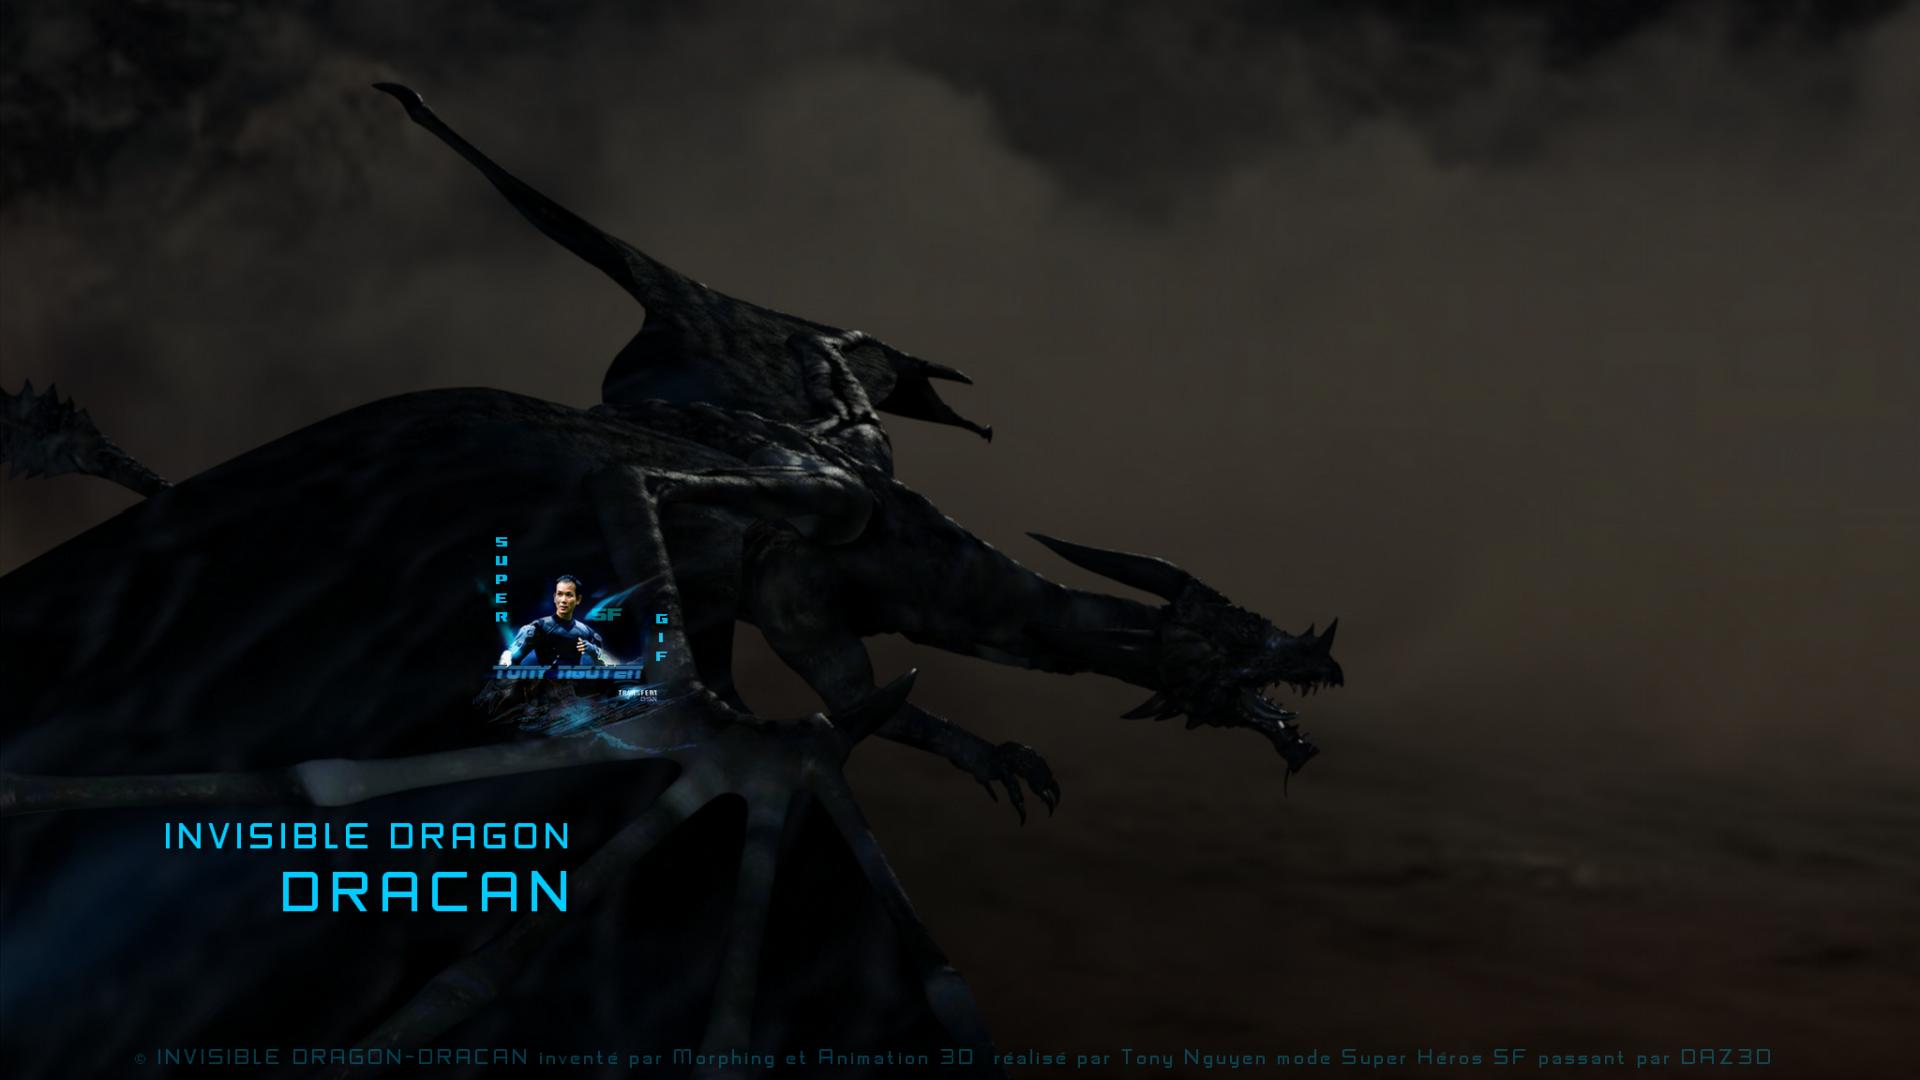 Dracan invisibledragon morphingsurdaz3d inventepartonynguyensf